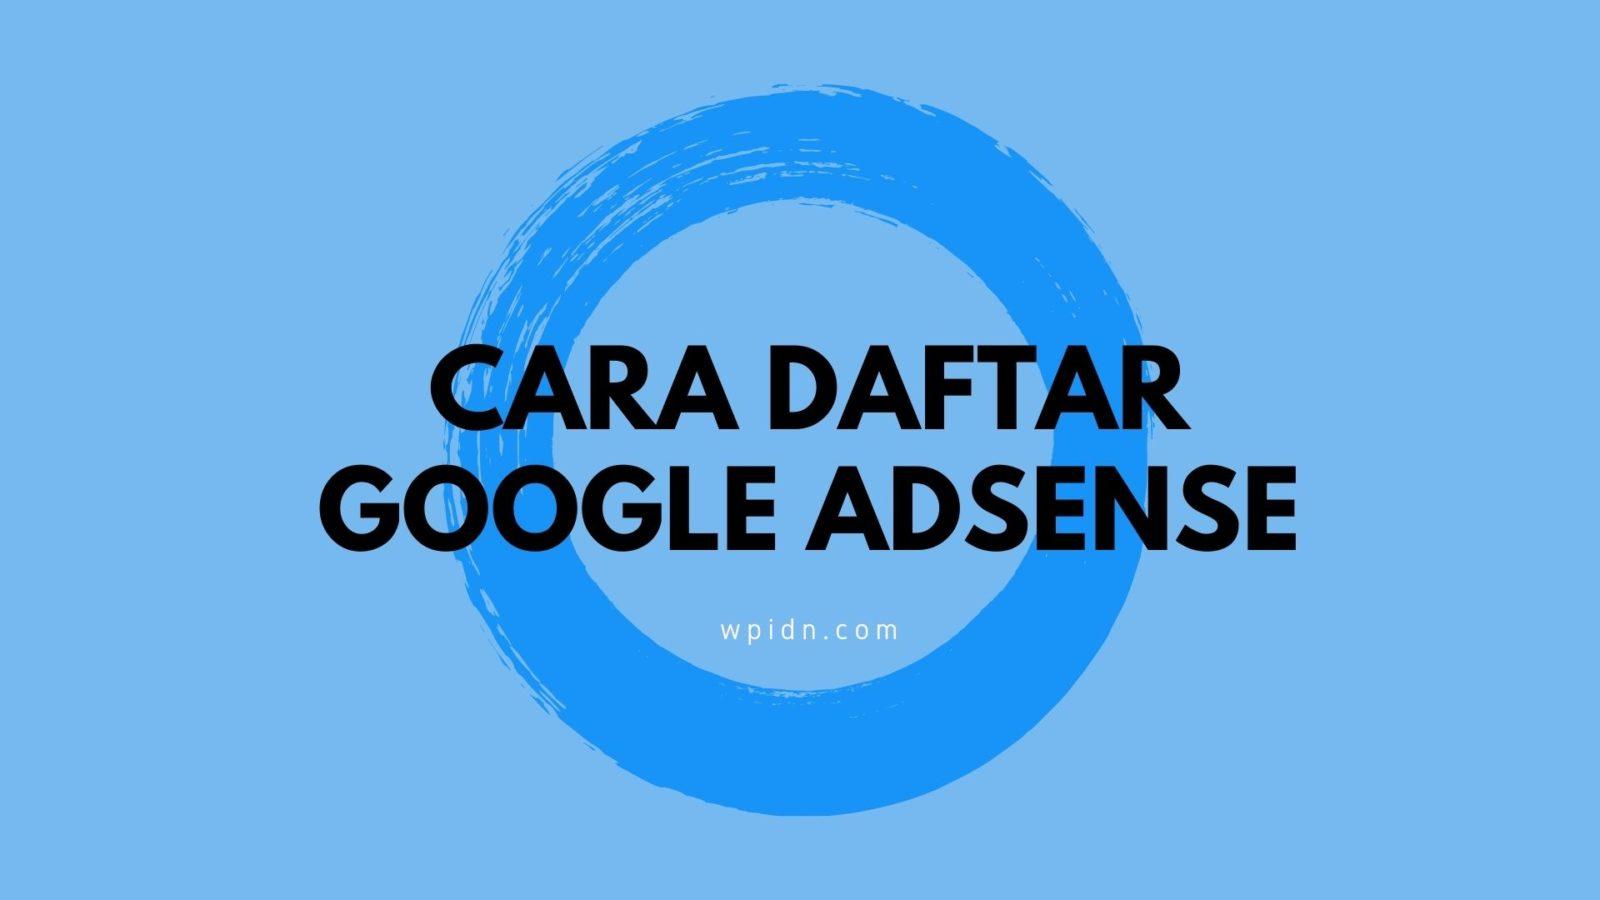 Cara daftar Google Adsense bagi pemula